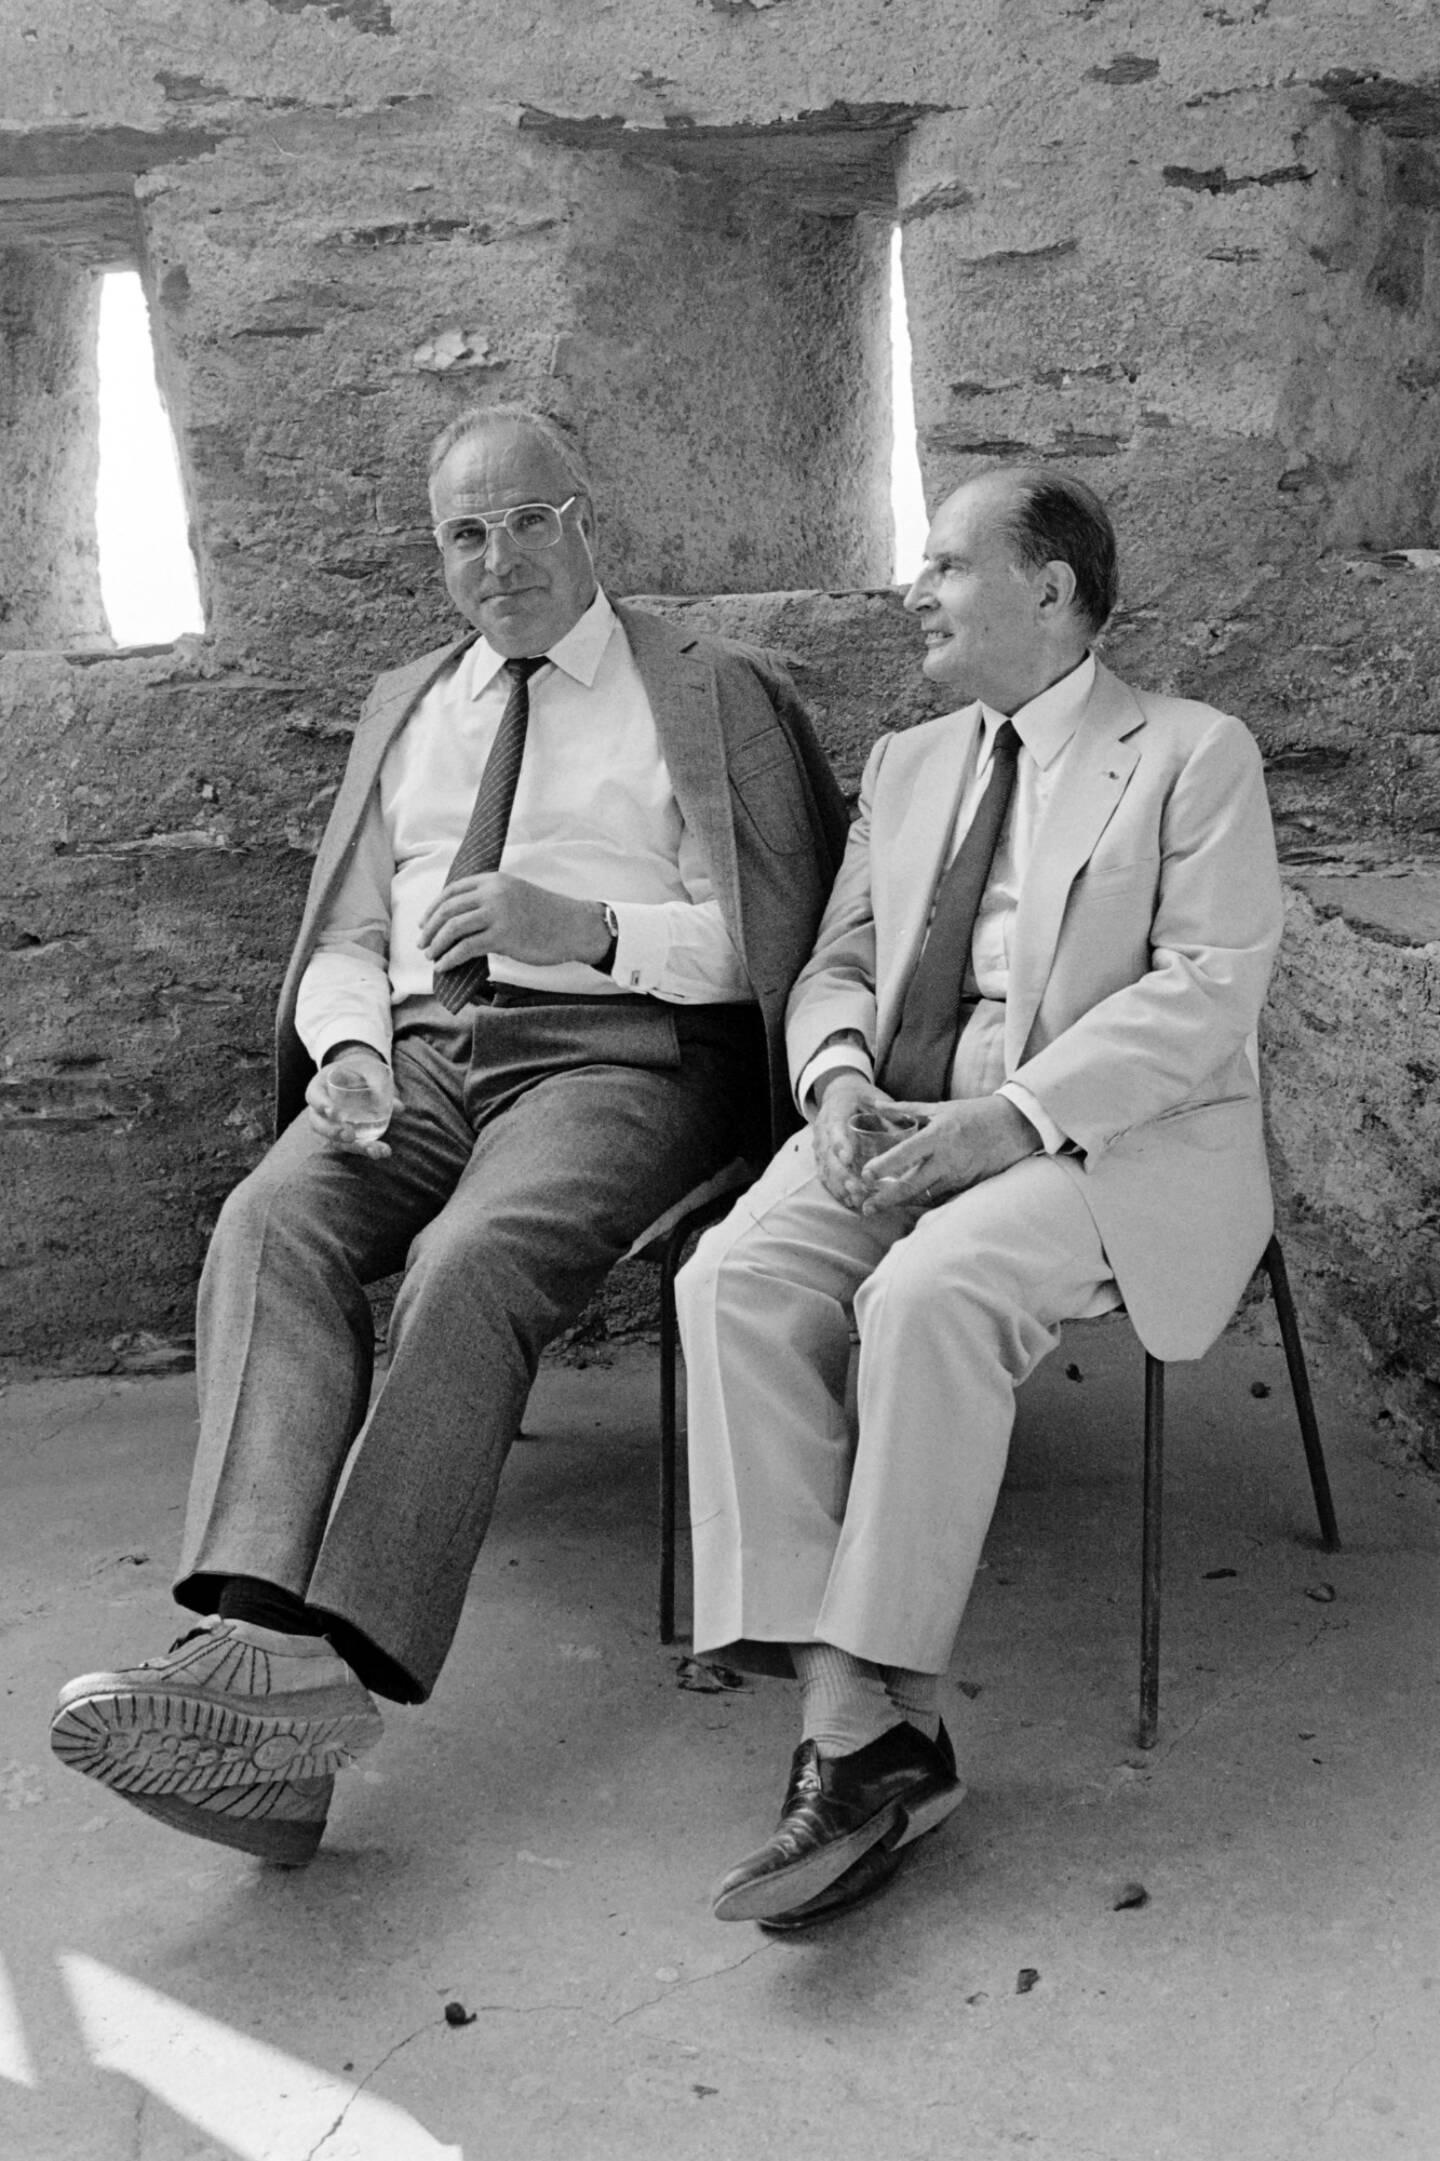 François Mitterrand à Brégançon (Var) avec Helmut Kohl